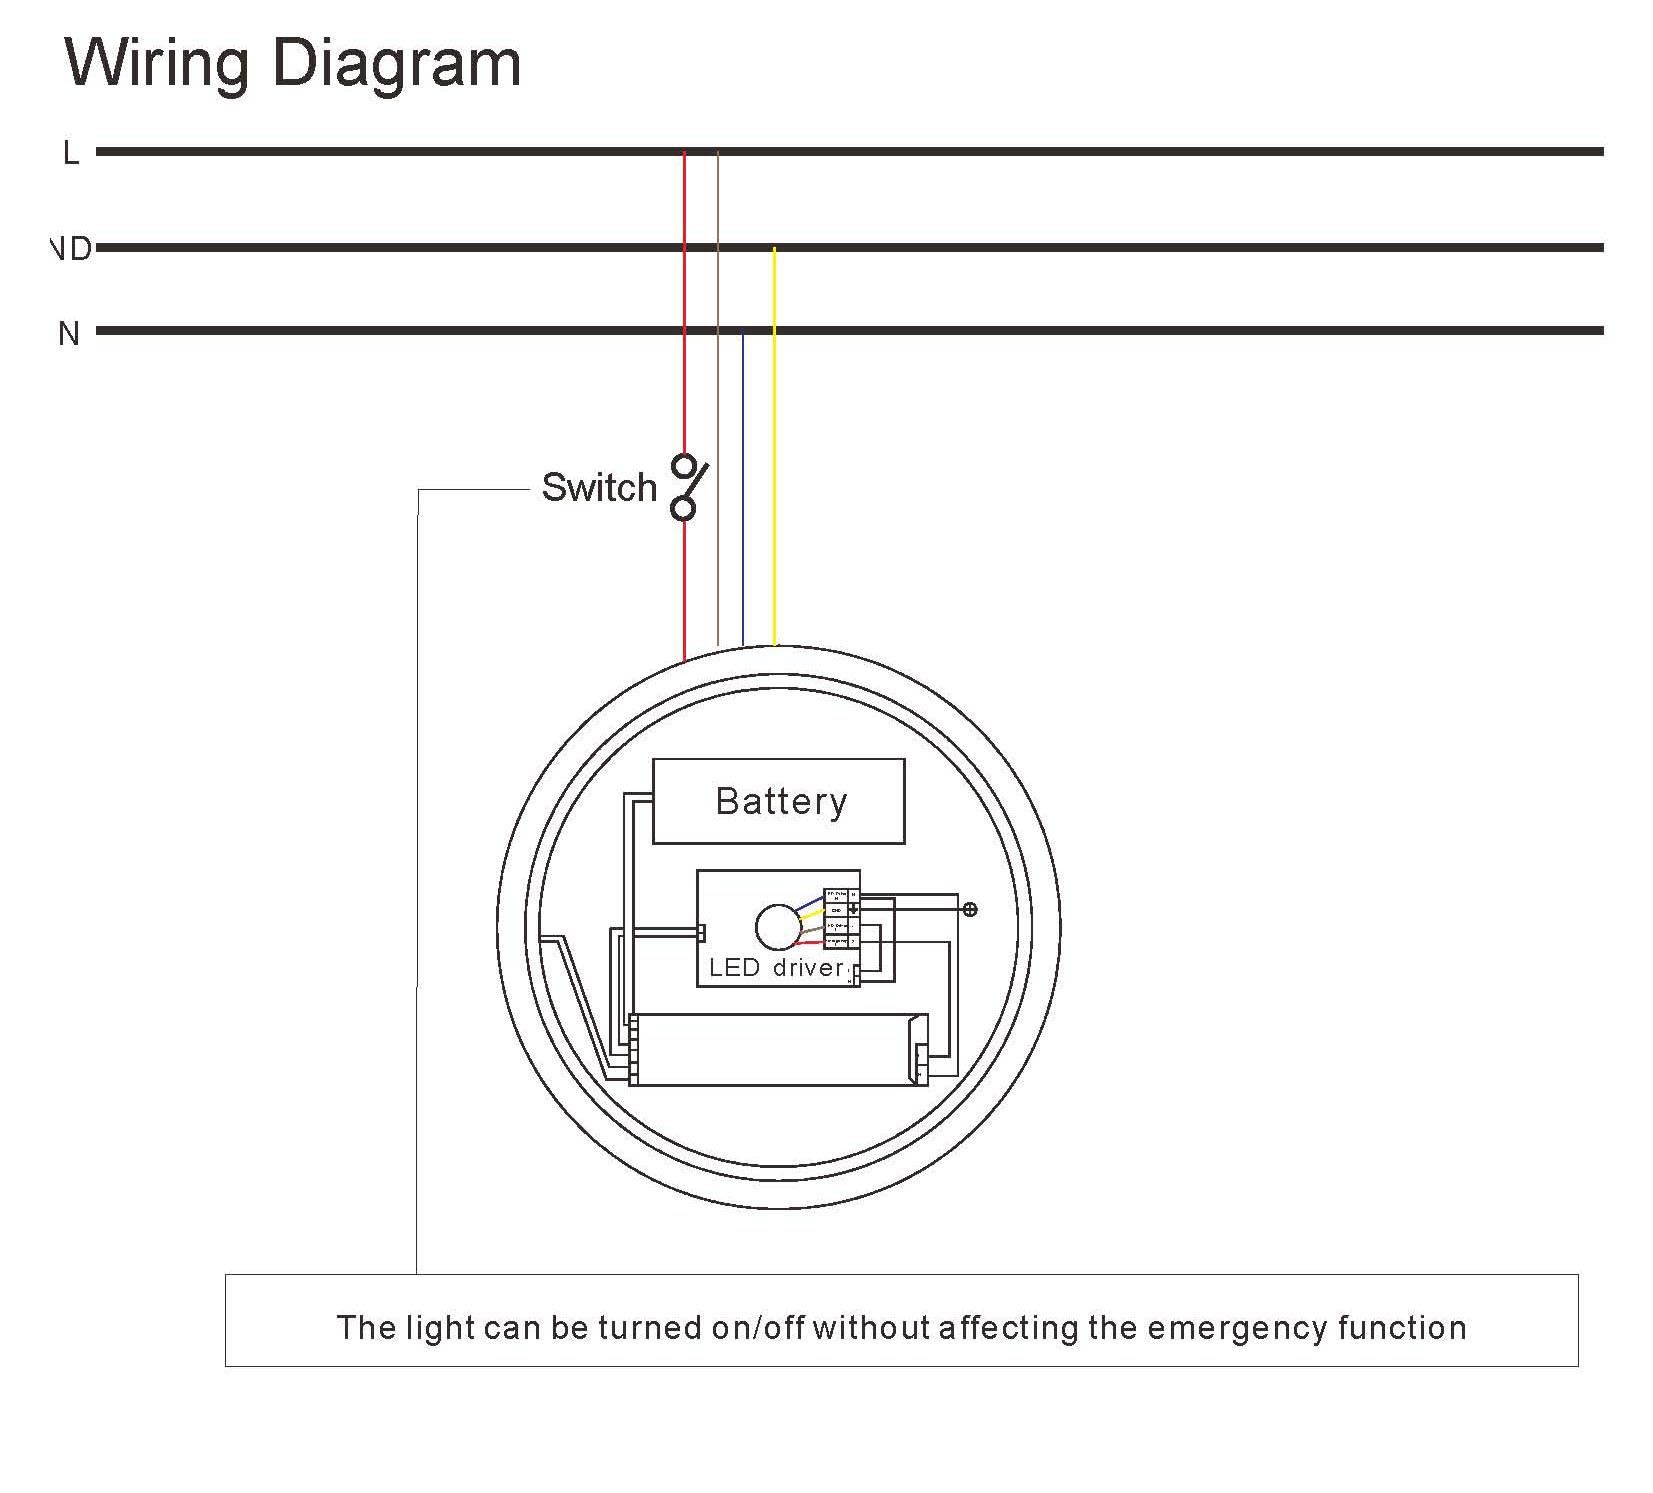 Emergency Light Wiring Diagram - Merzie.net on